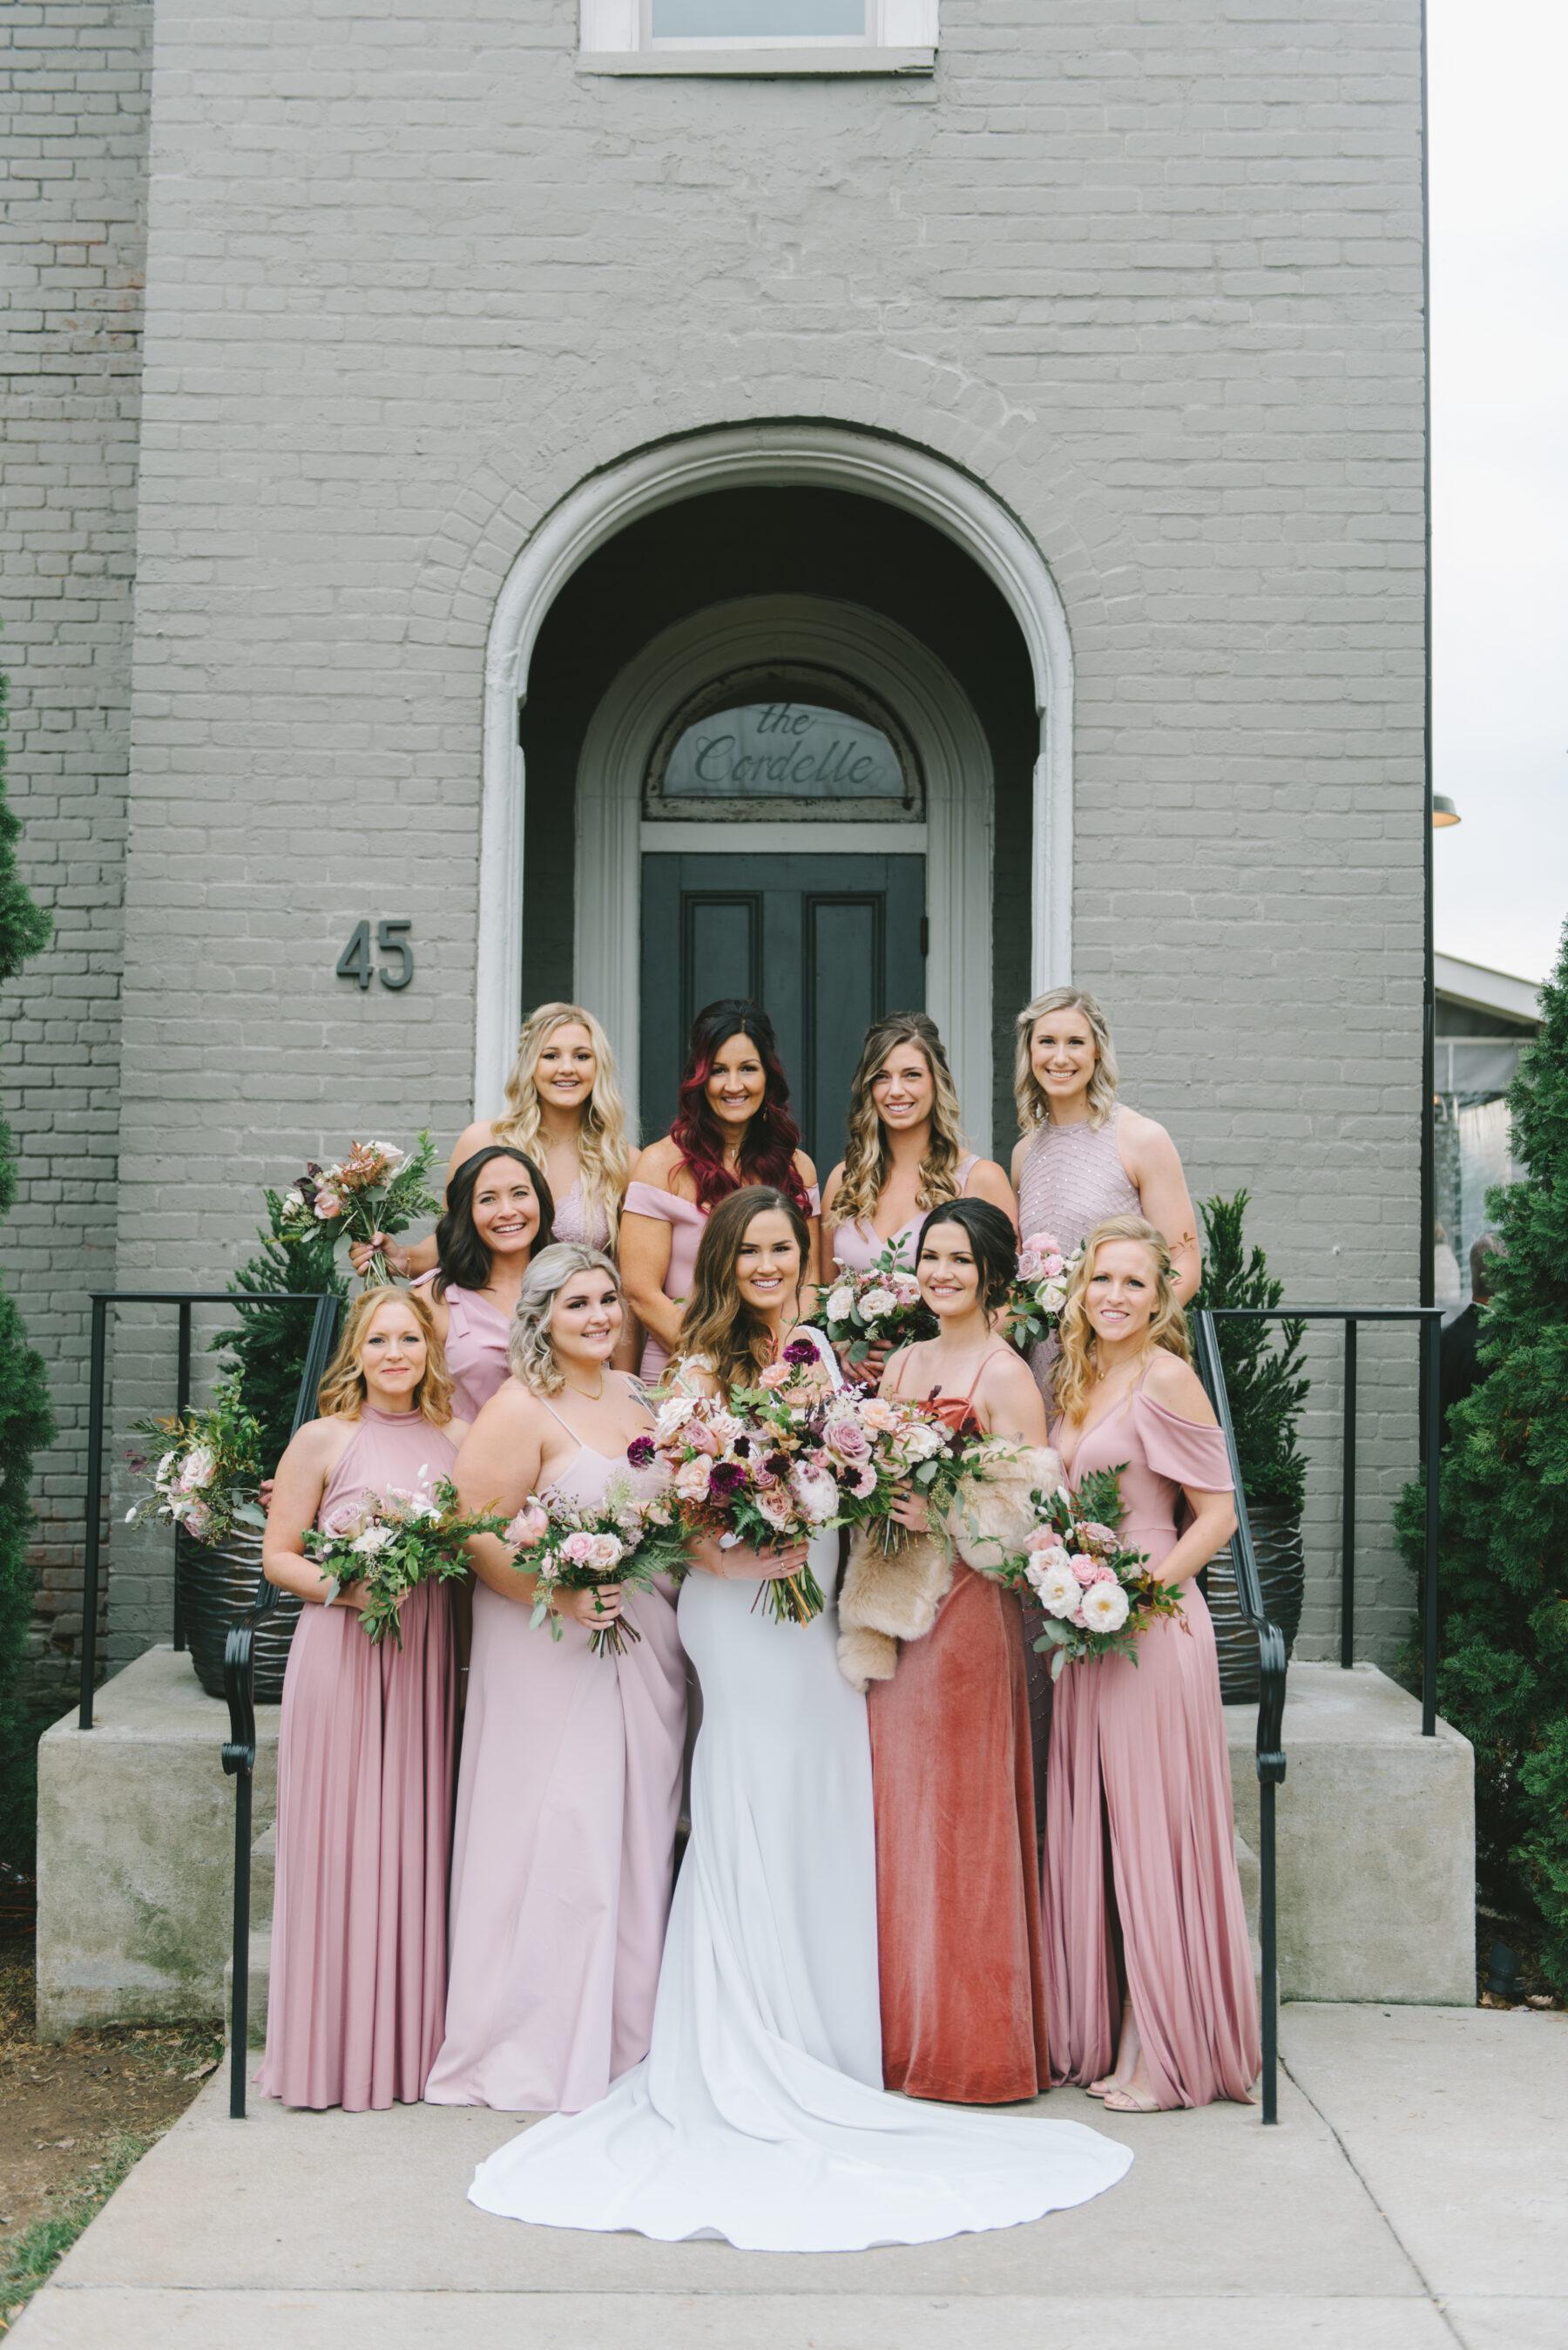 Shades of Pink Bridesmaid Dresses | Nashville Bride Guide